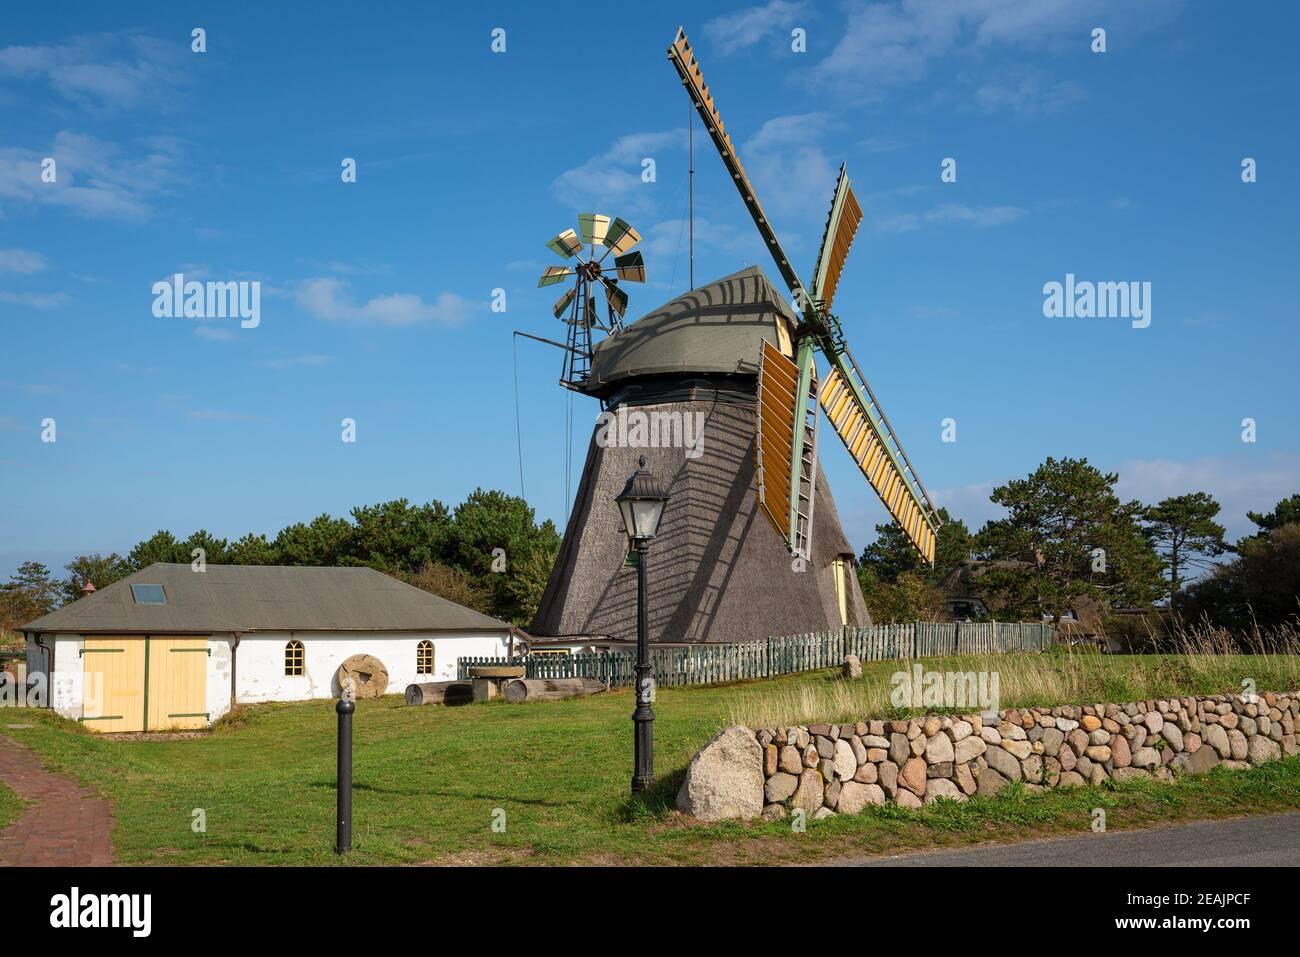 Windmill, Nebel, Amrum, Germany Stock Photo